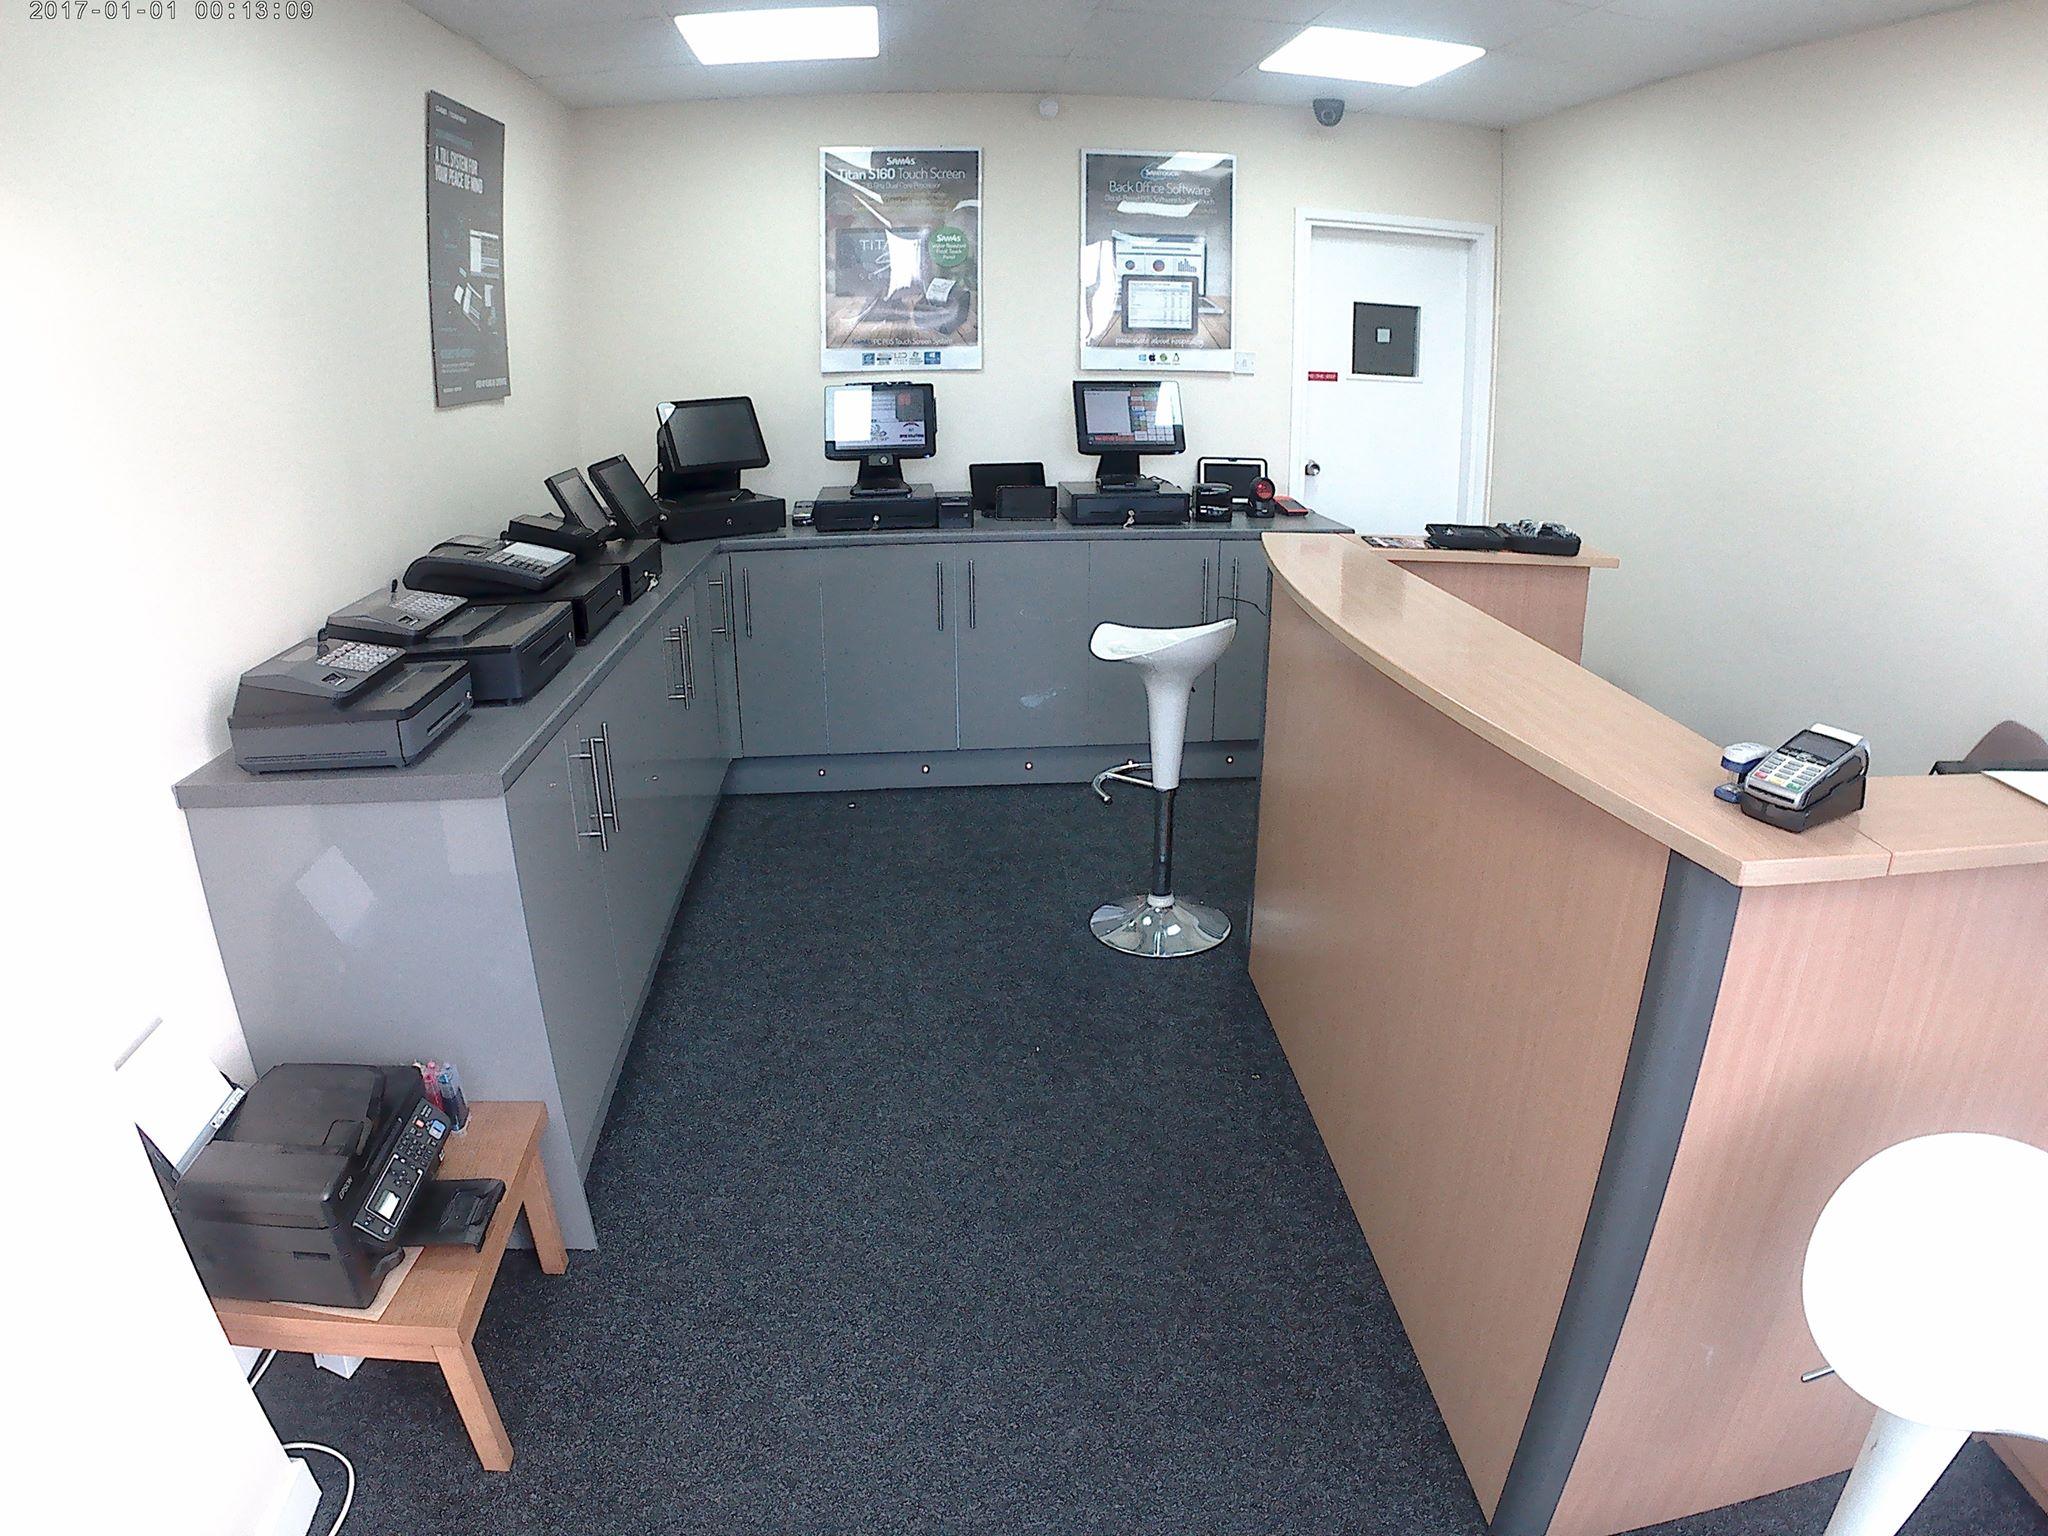 epos showroom inside